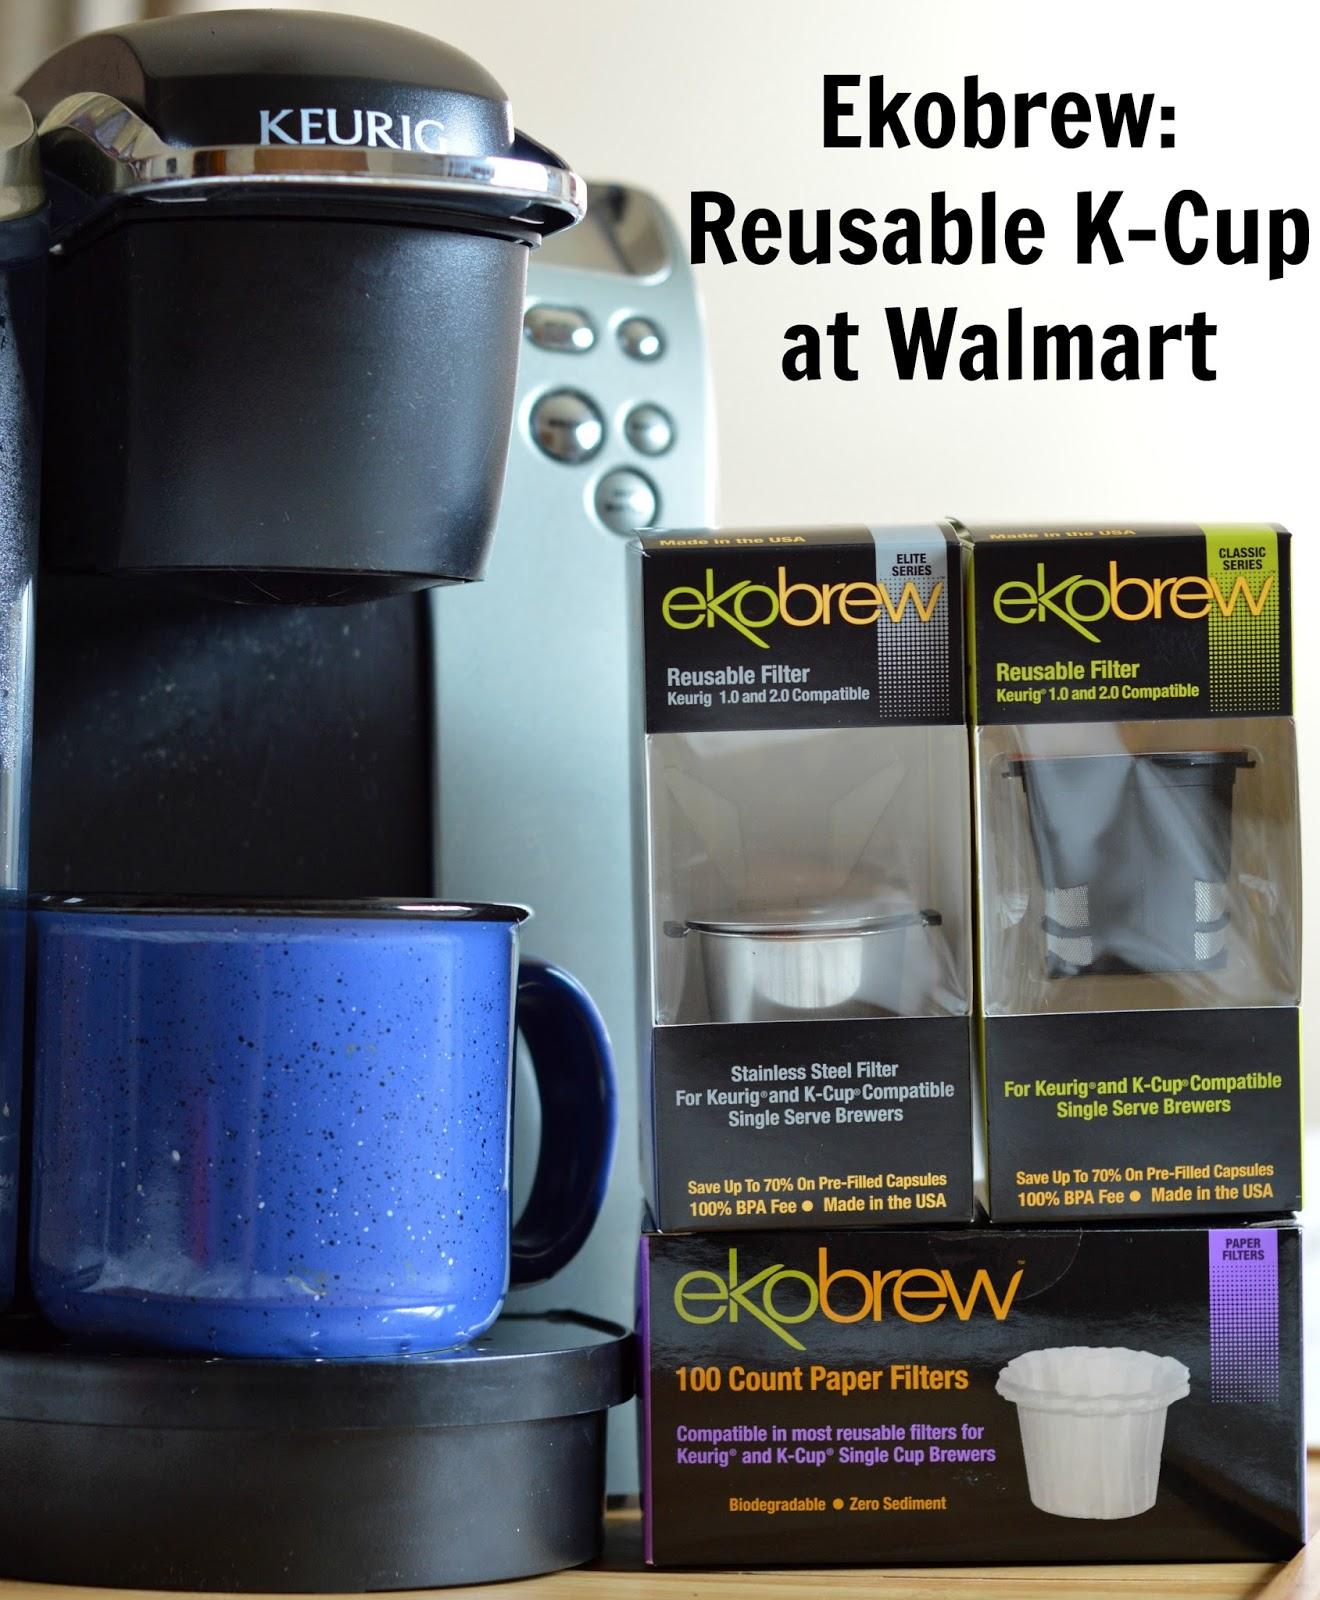 How Ekobrew Reusable K Cup Restores My Humanity